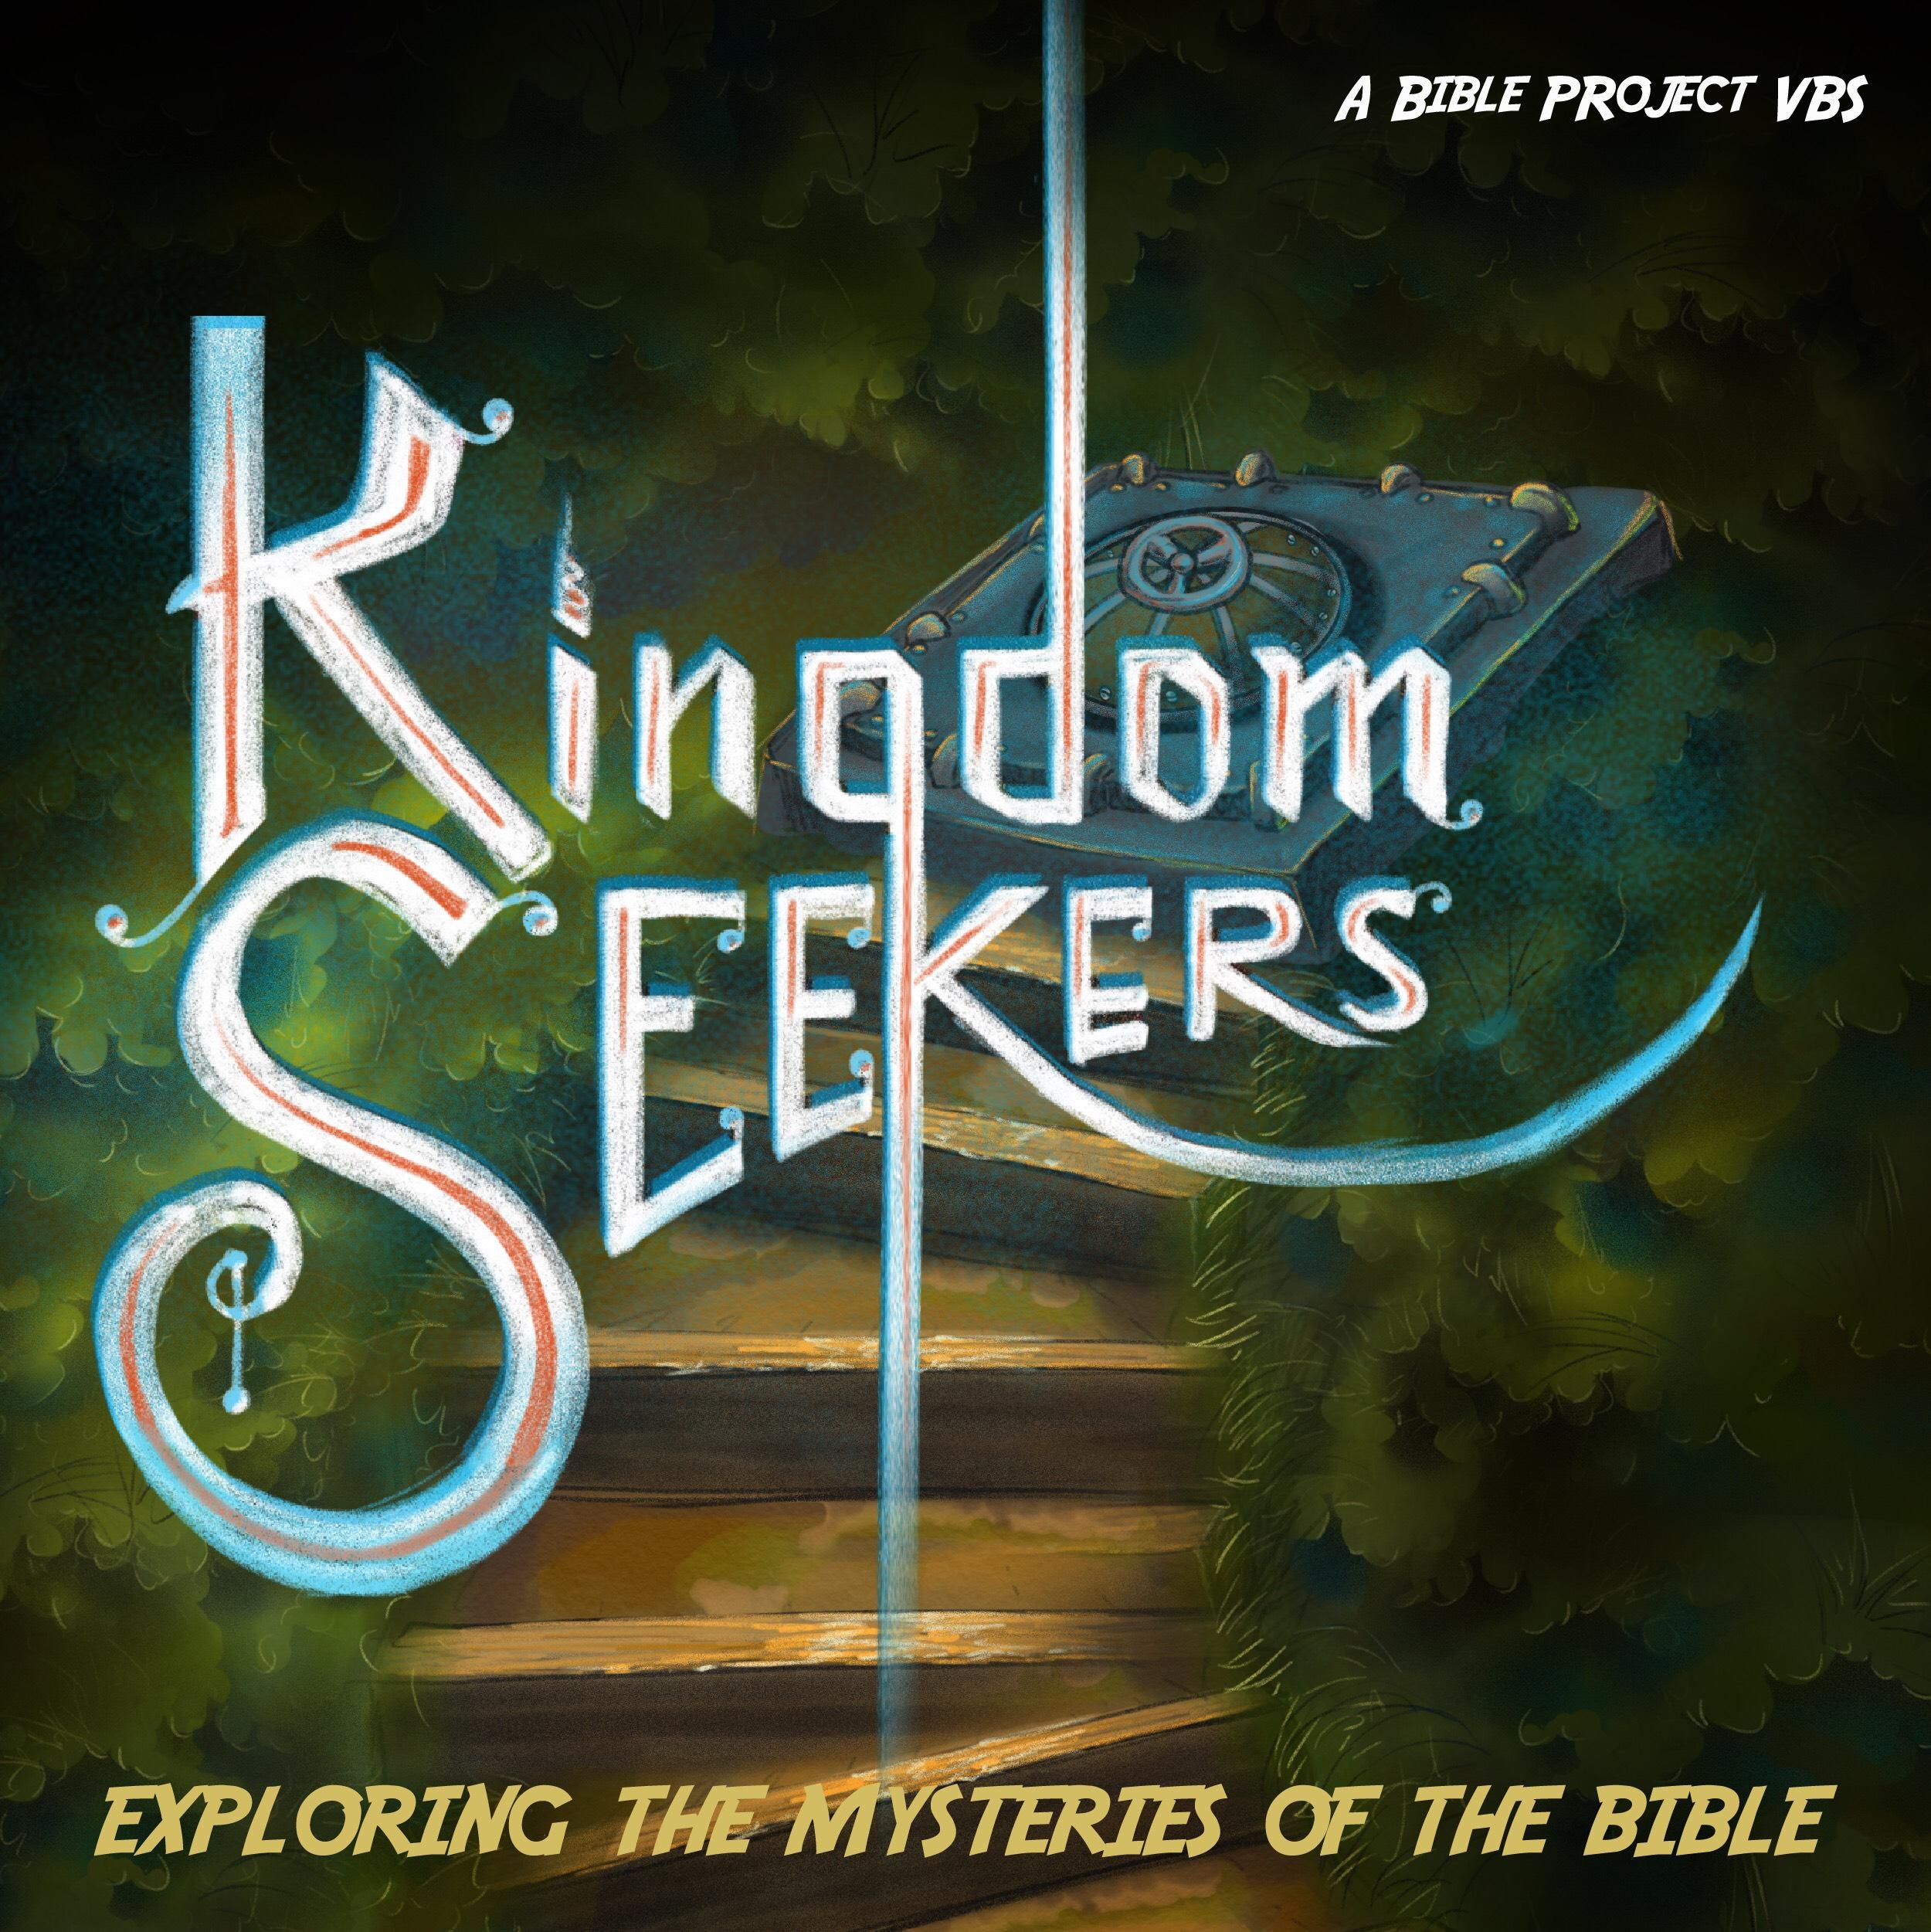 Kingdom Seekers Thumbnail (JPG)